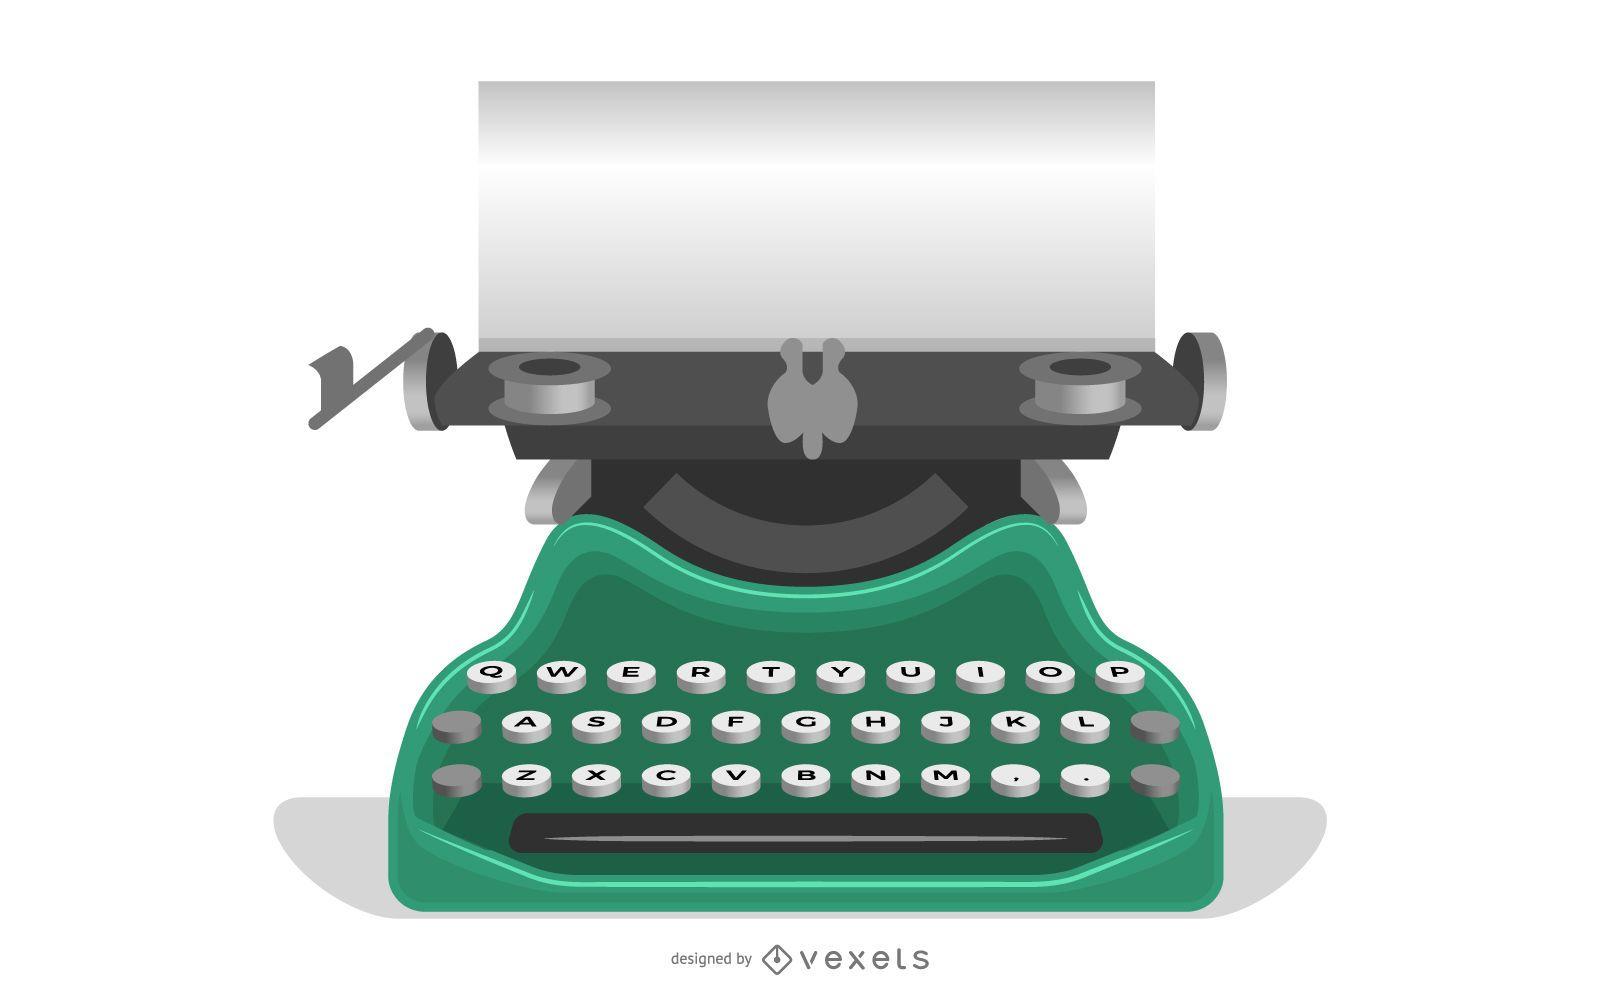 Vieja máquina de escribir con un papel